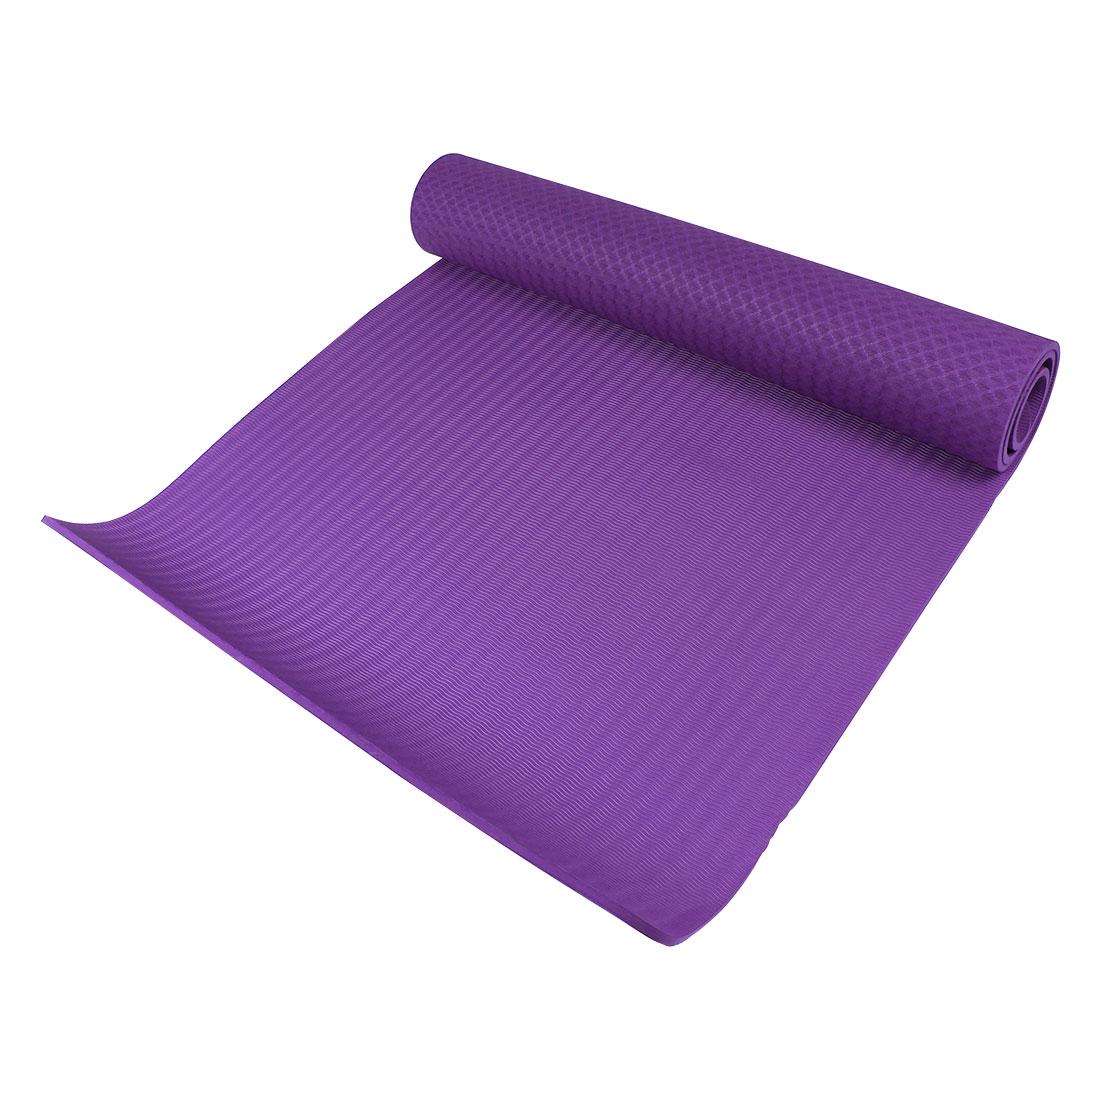 Indoor Exercise Folding Anti Slip Yoga Pilates Practice Mat Cushion Dark Purple - image 5 de 5